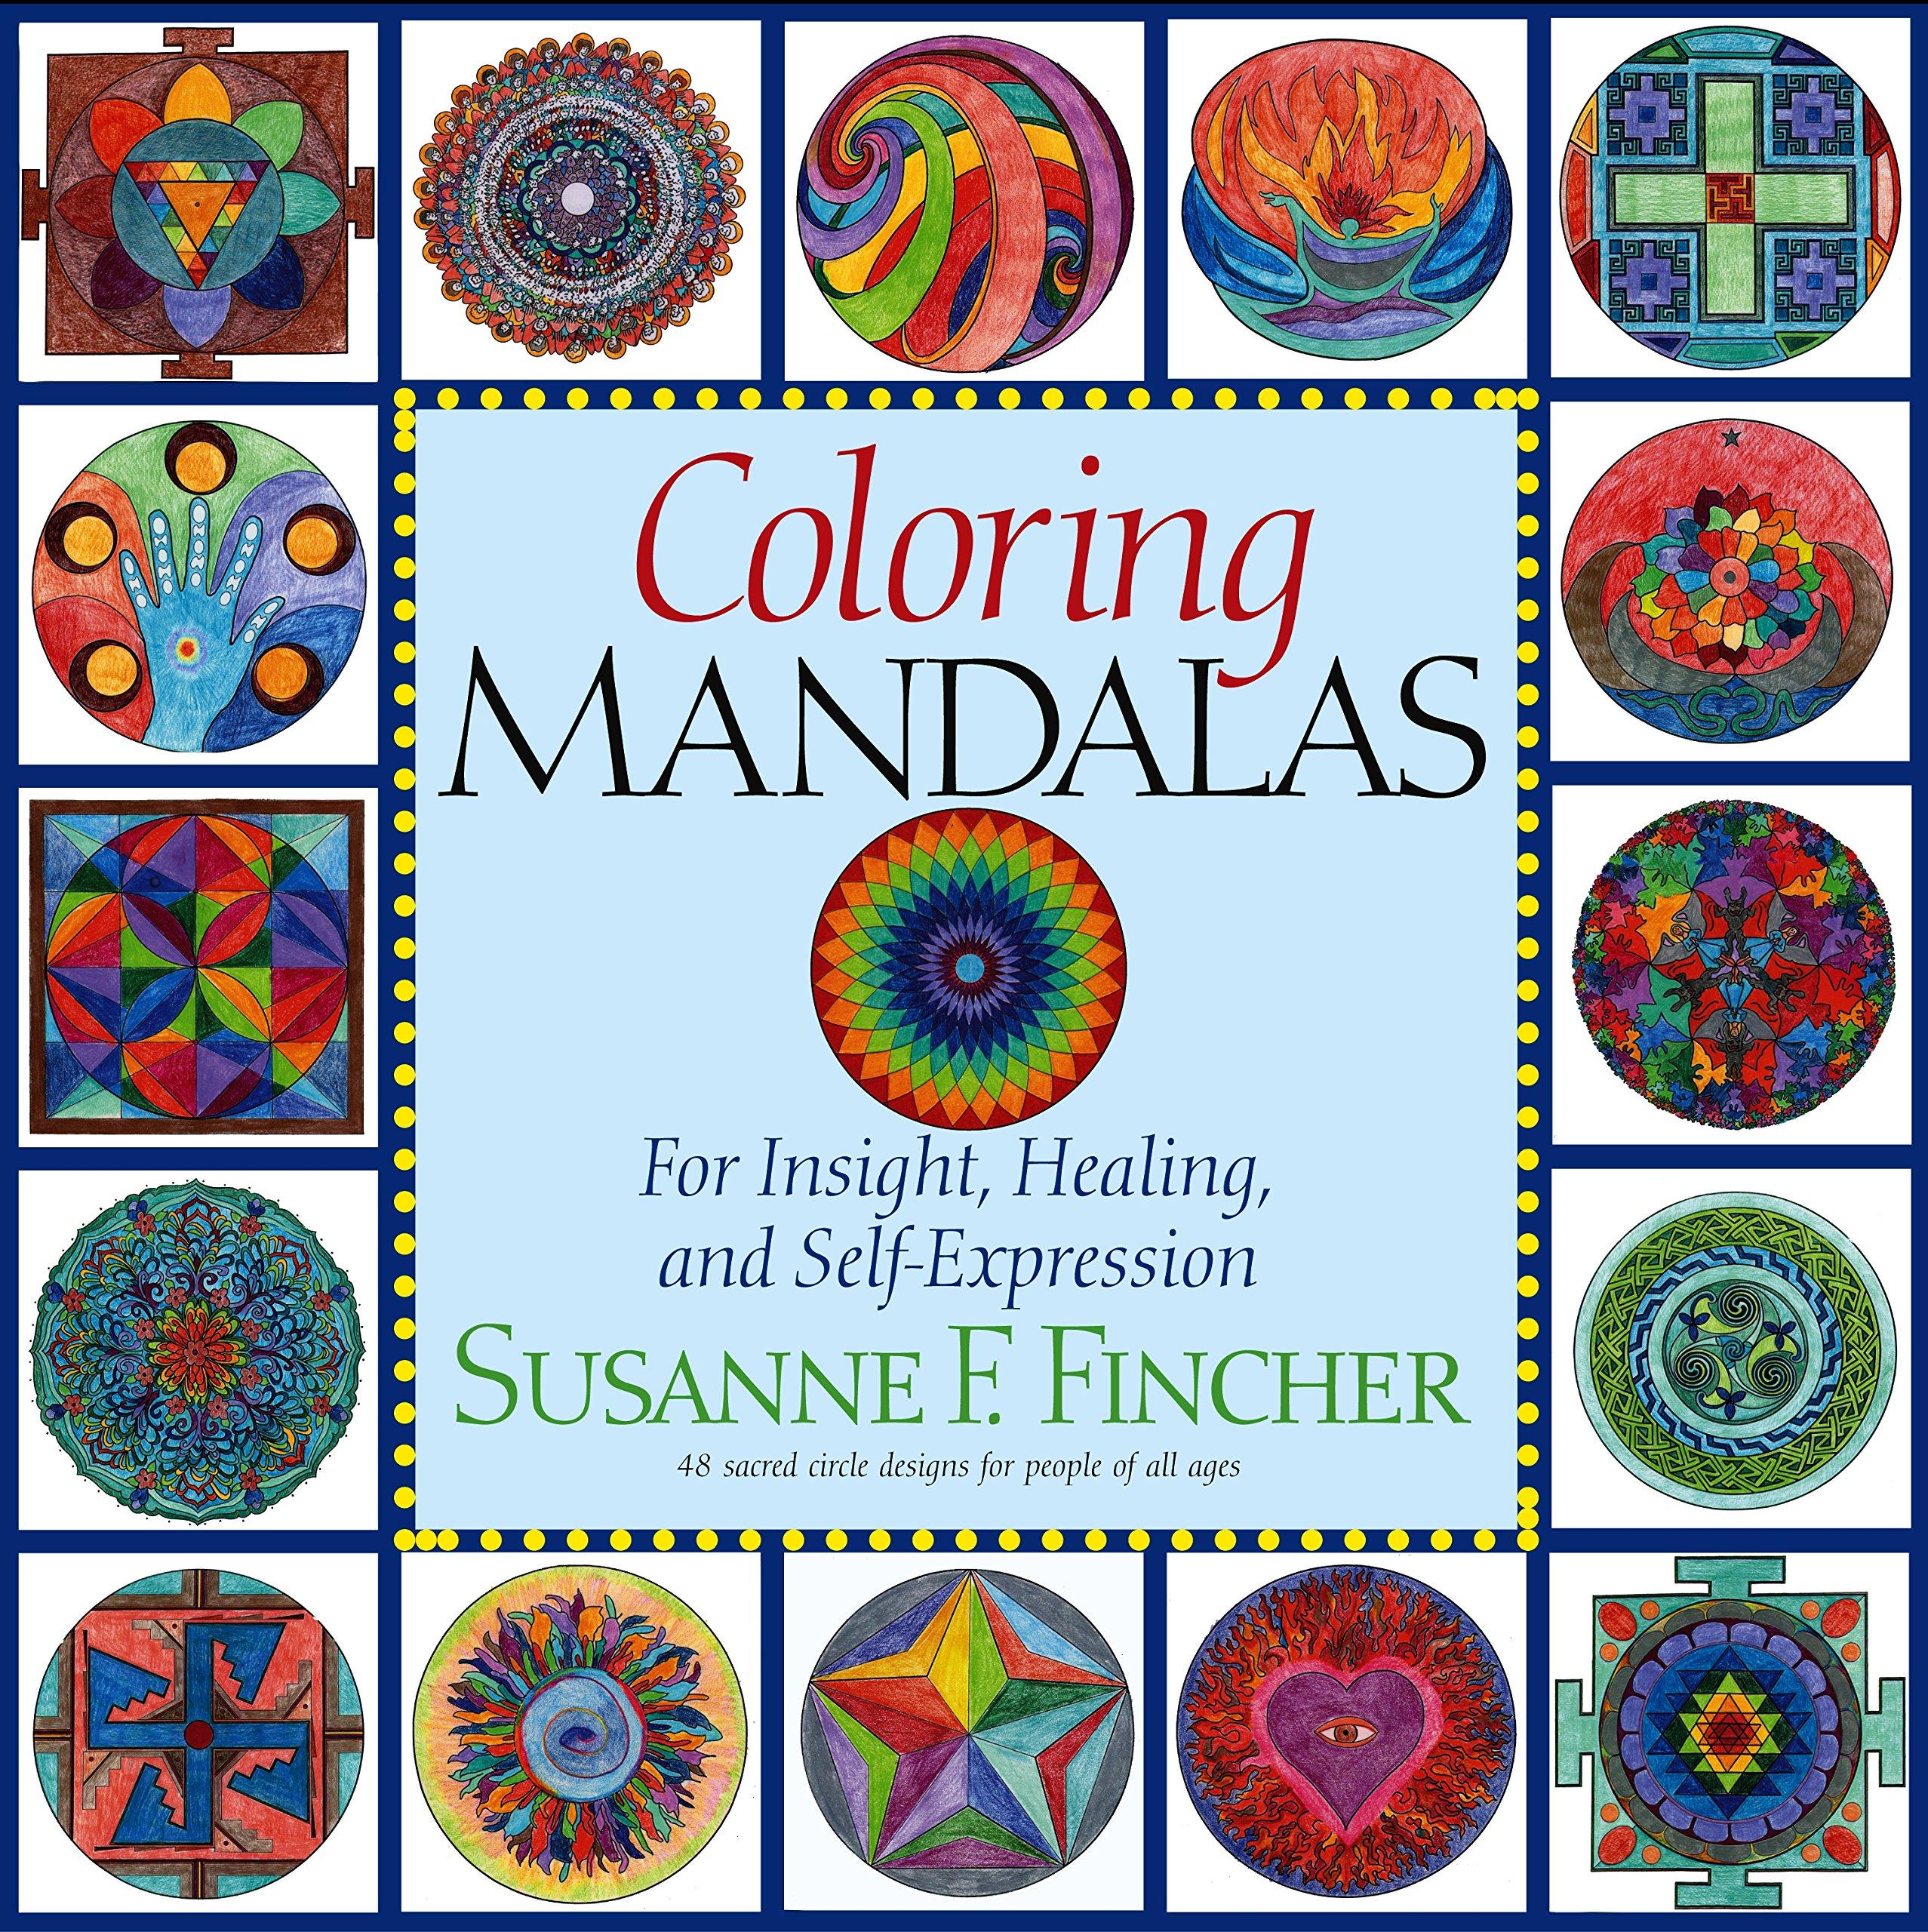 Coloring Mandalas Insight Healing Self Expression product image